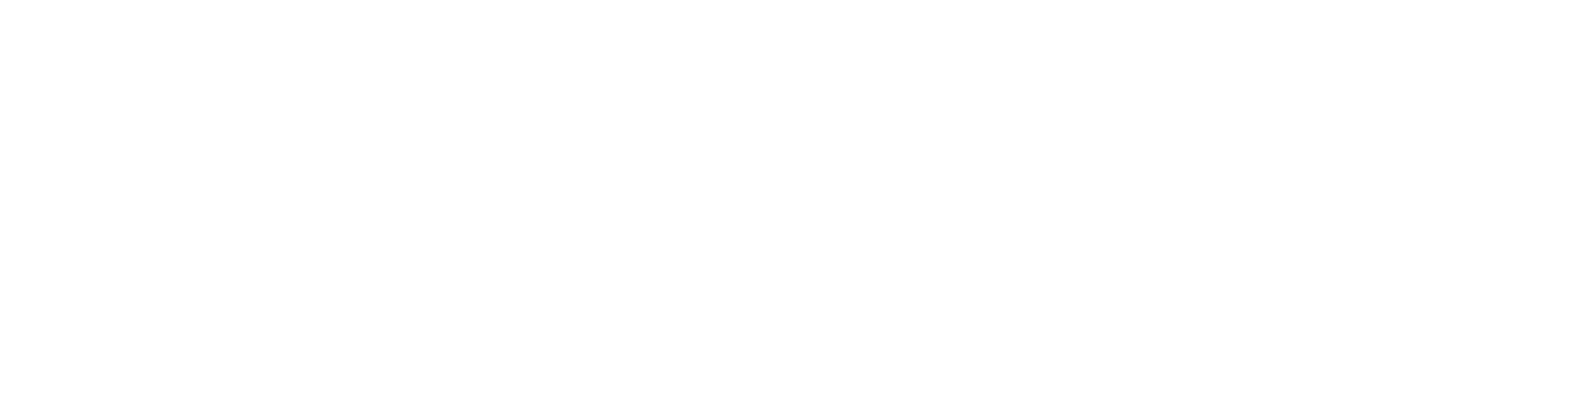 Infinigate_Logo_Landscape_2014_white